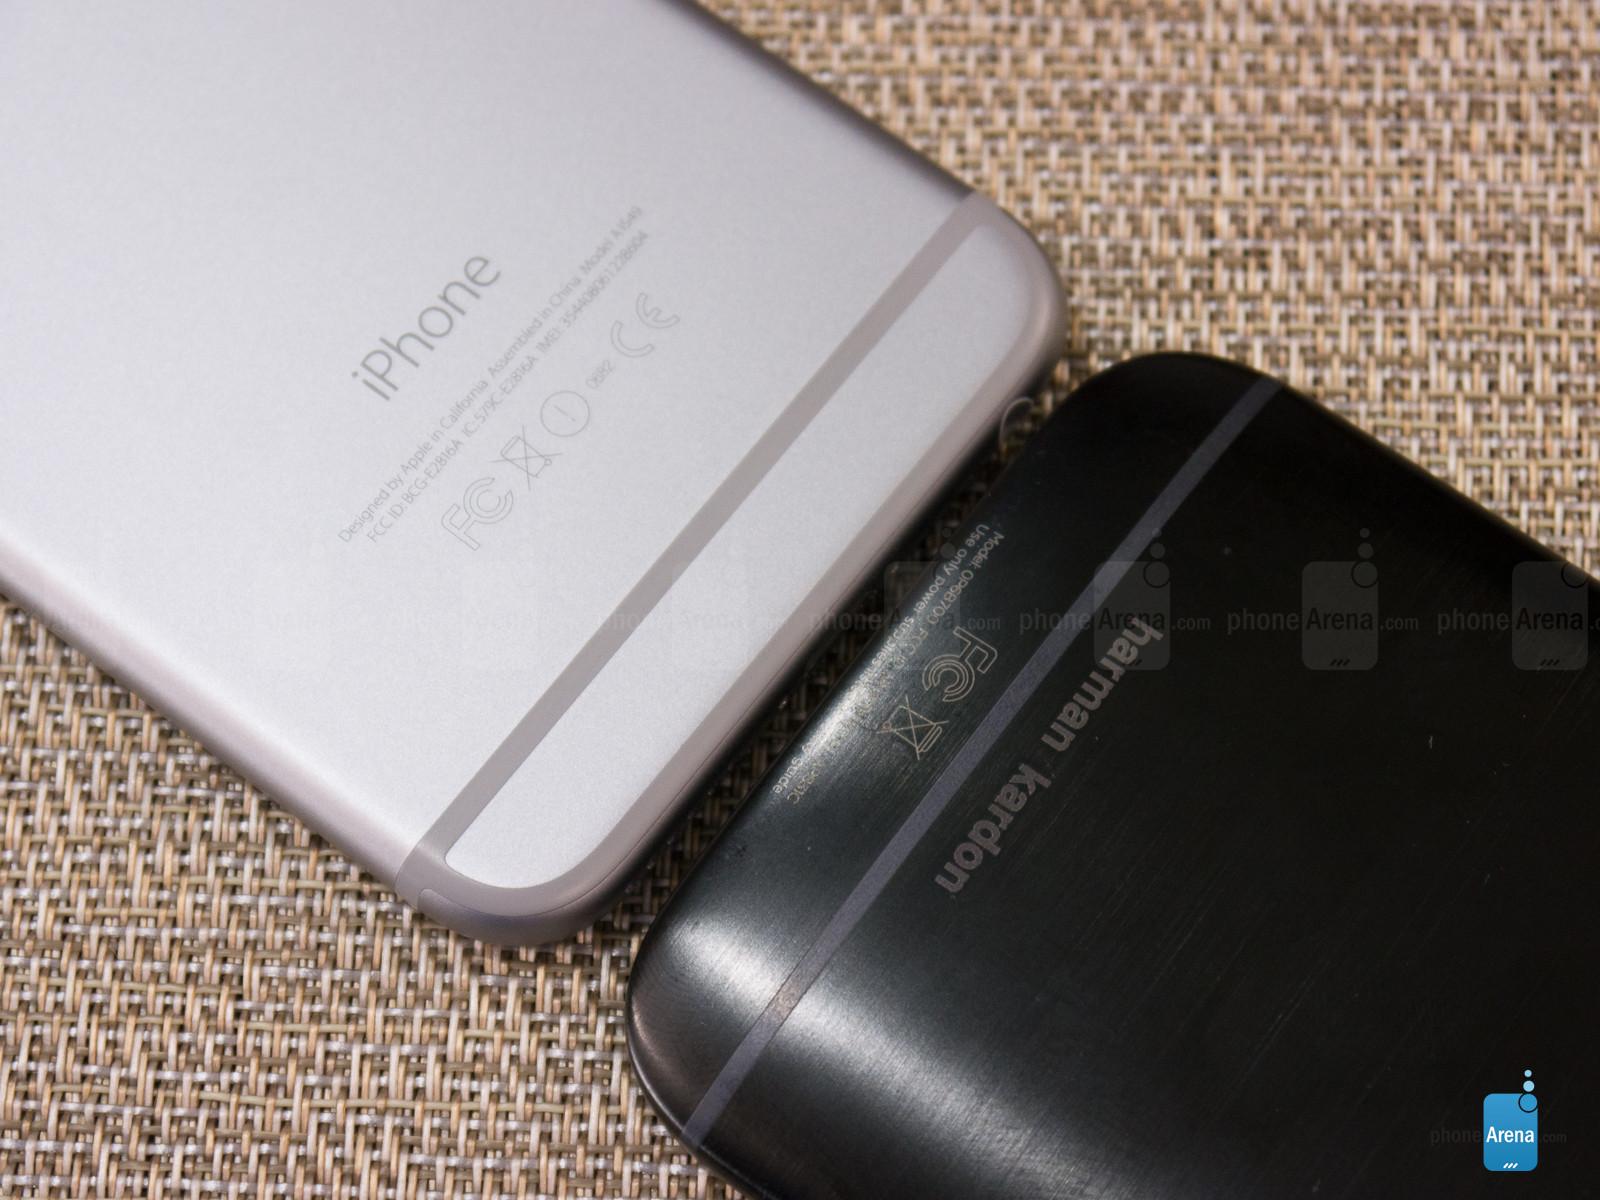 1422701037_iphone-6-versus-htc-one-m8-harmankardon-edition-7.jpg